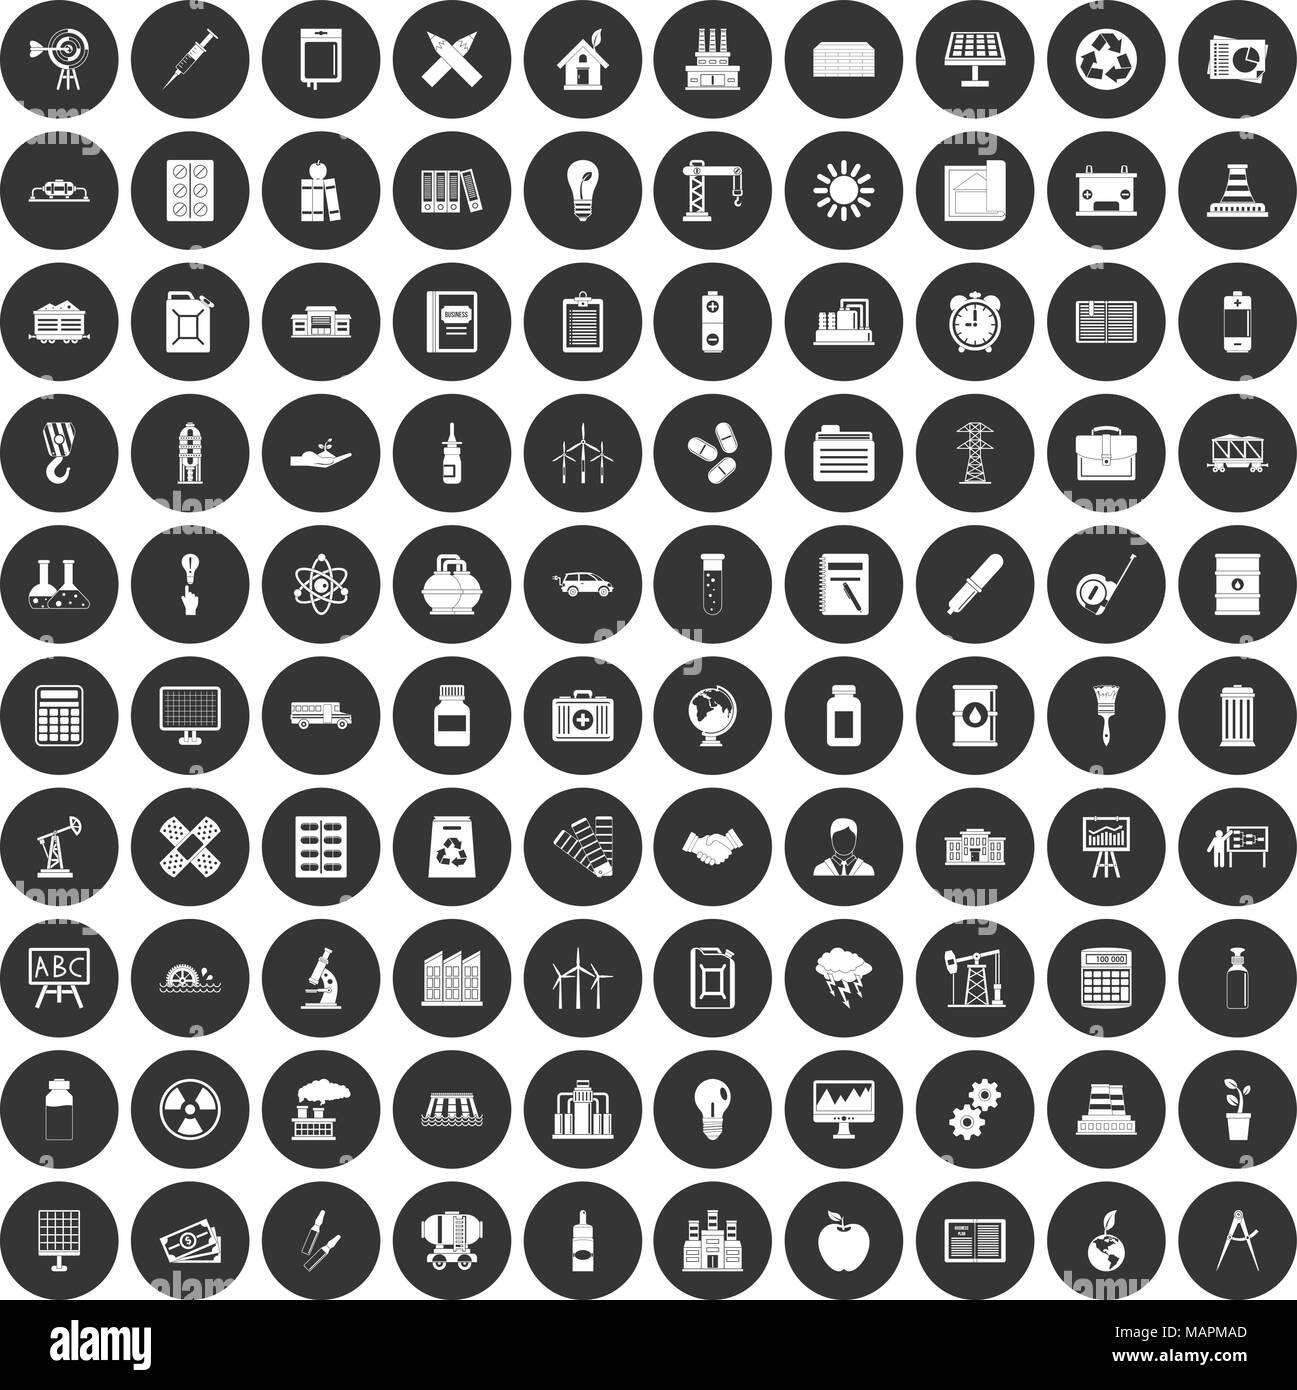 100 company icons set black circle Stock Vector